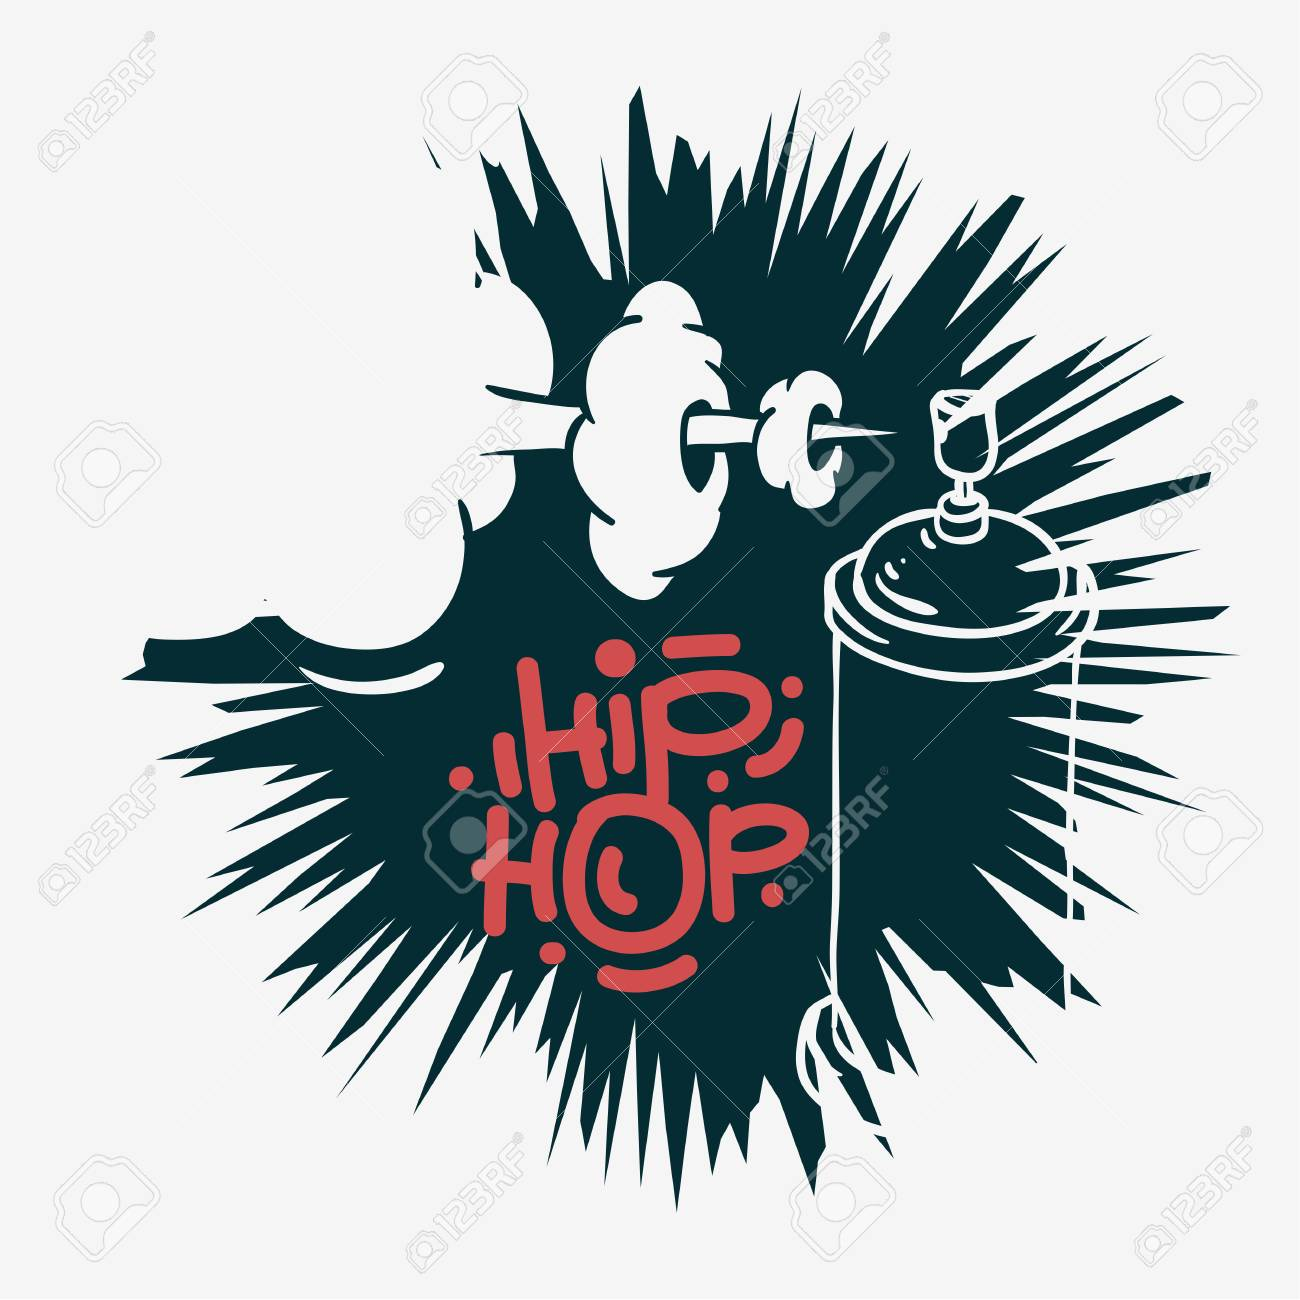 hip hop design with a graffiti spray can baloon artistic cartoon